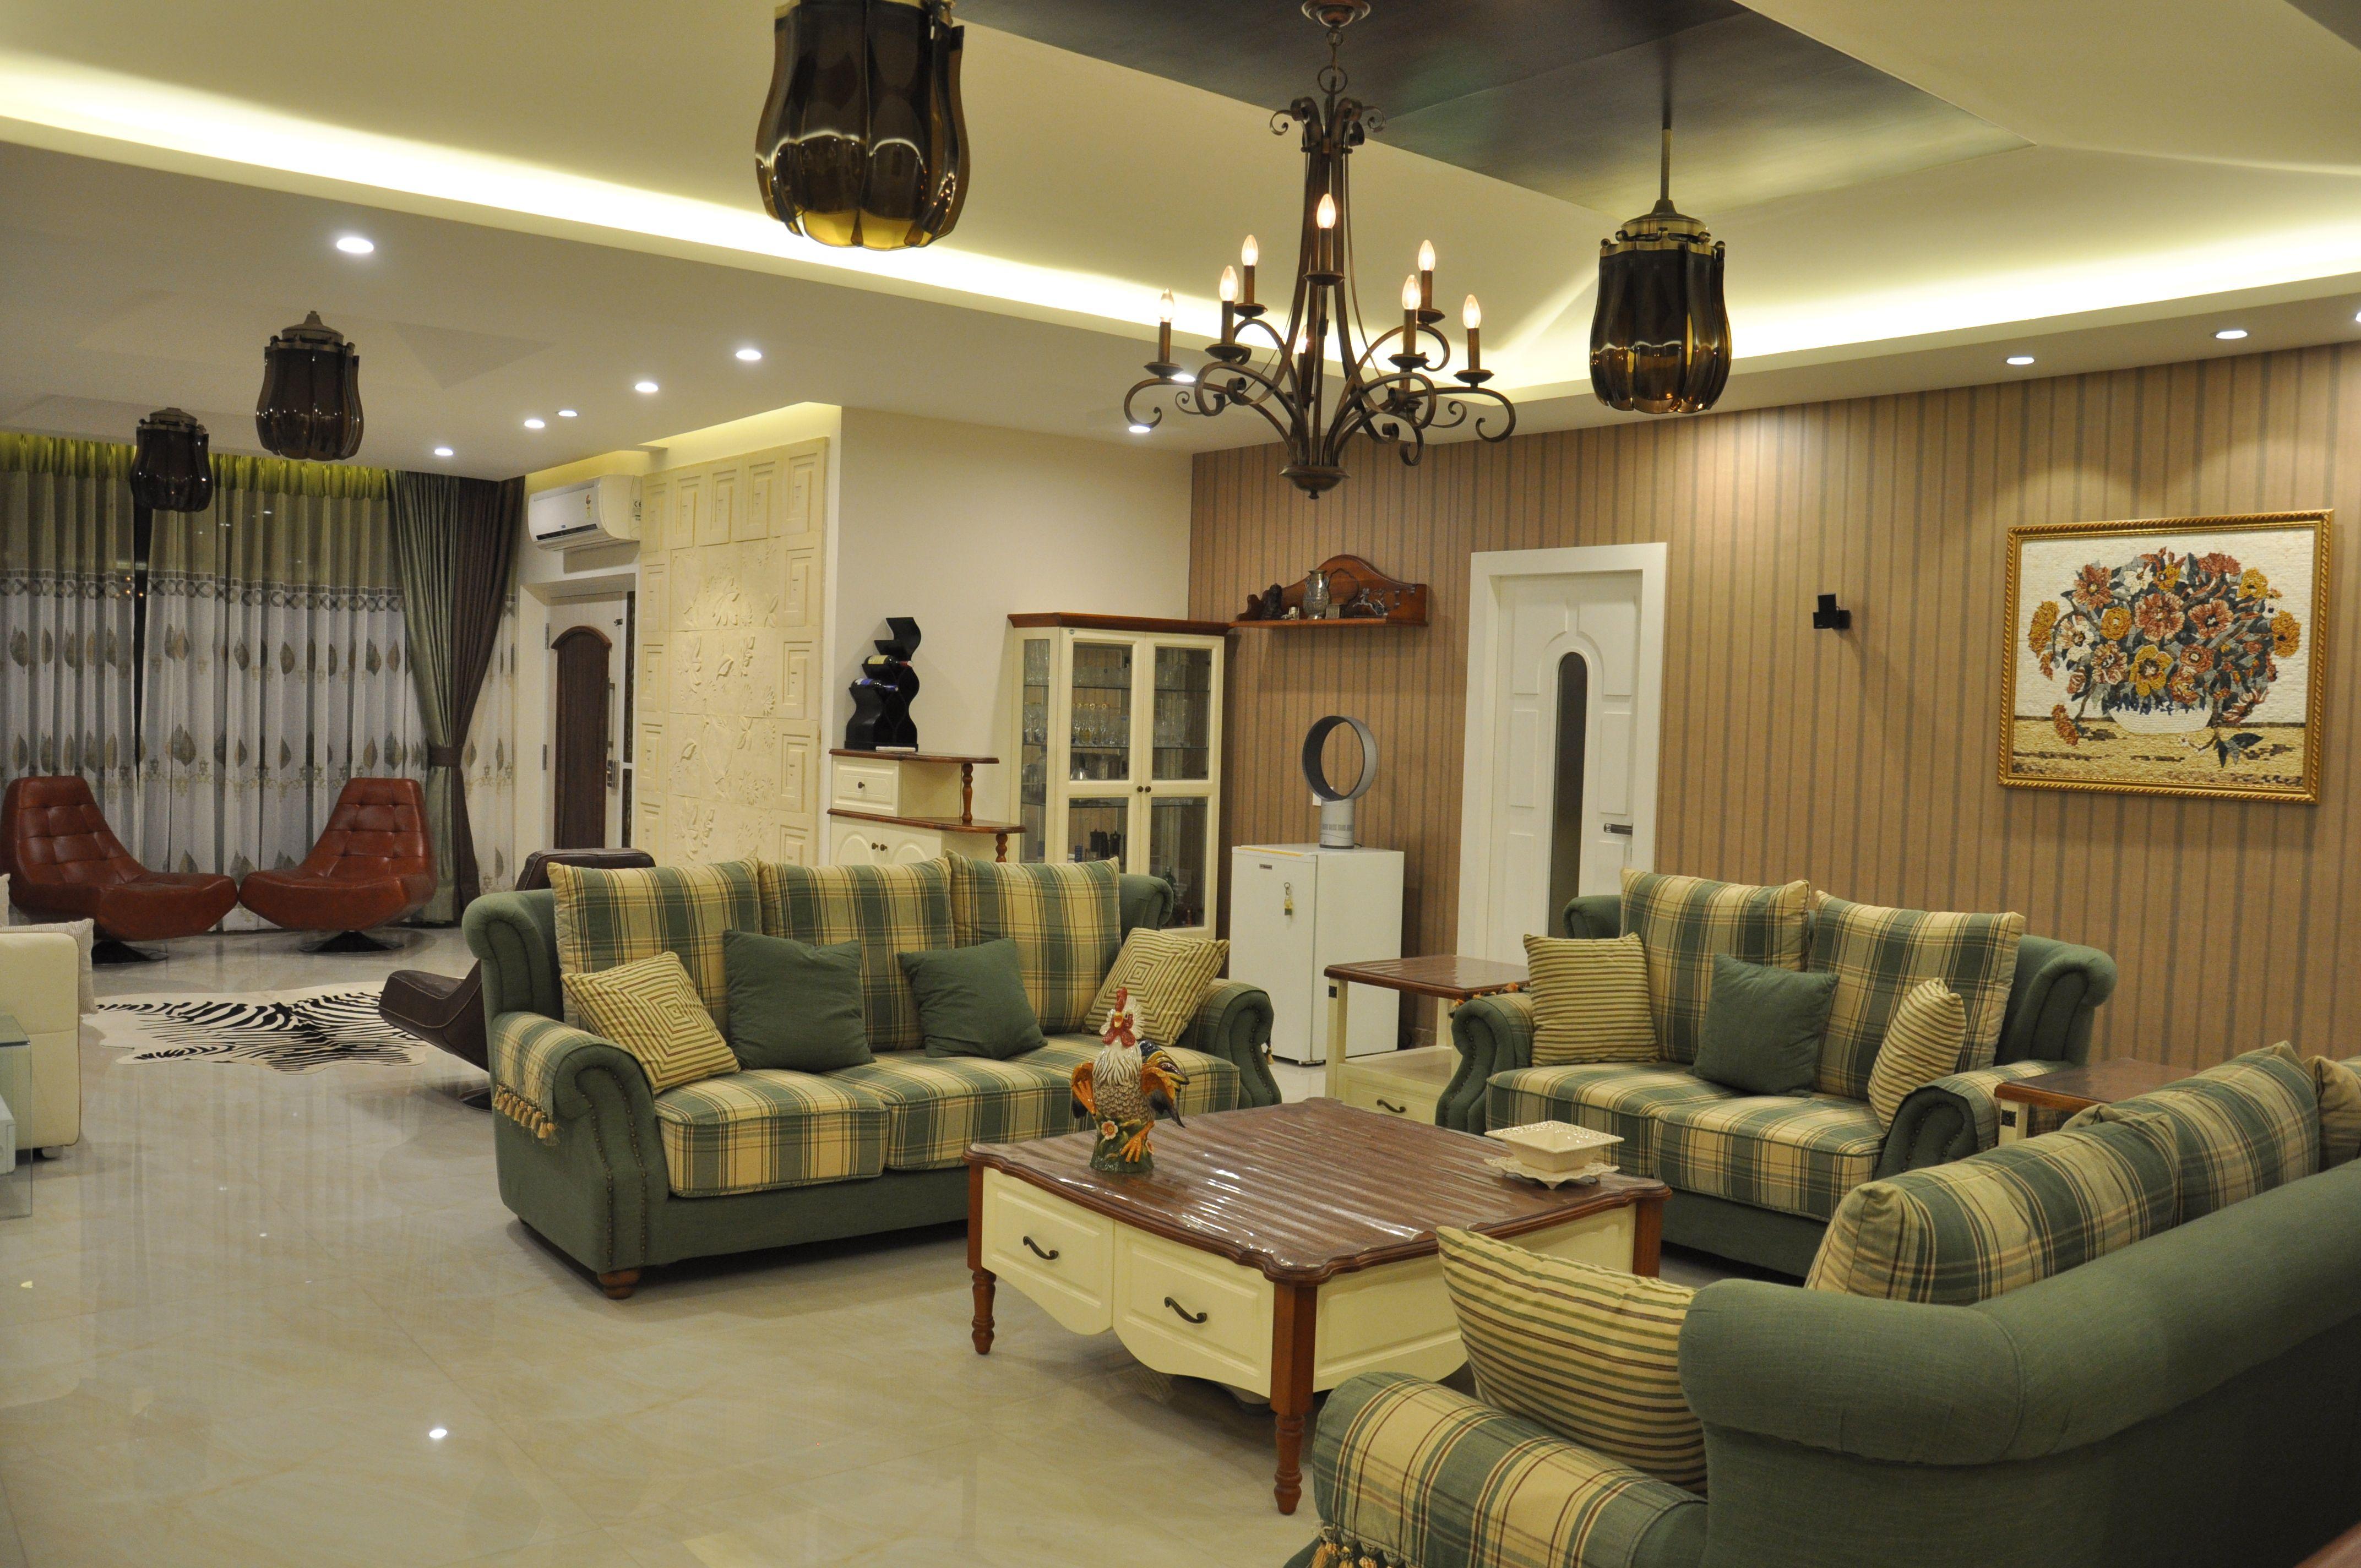 Interior Design Ideas in Hyderabad Villa Interior Design Ideas in